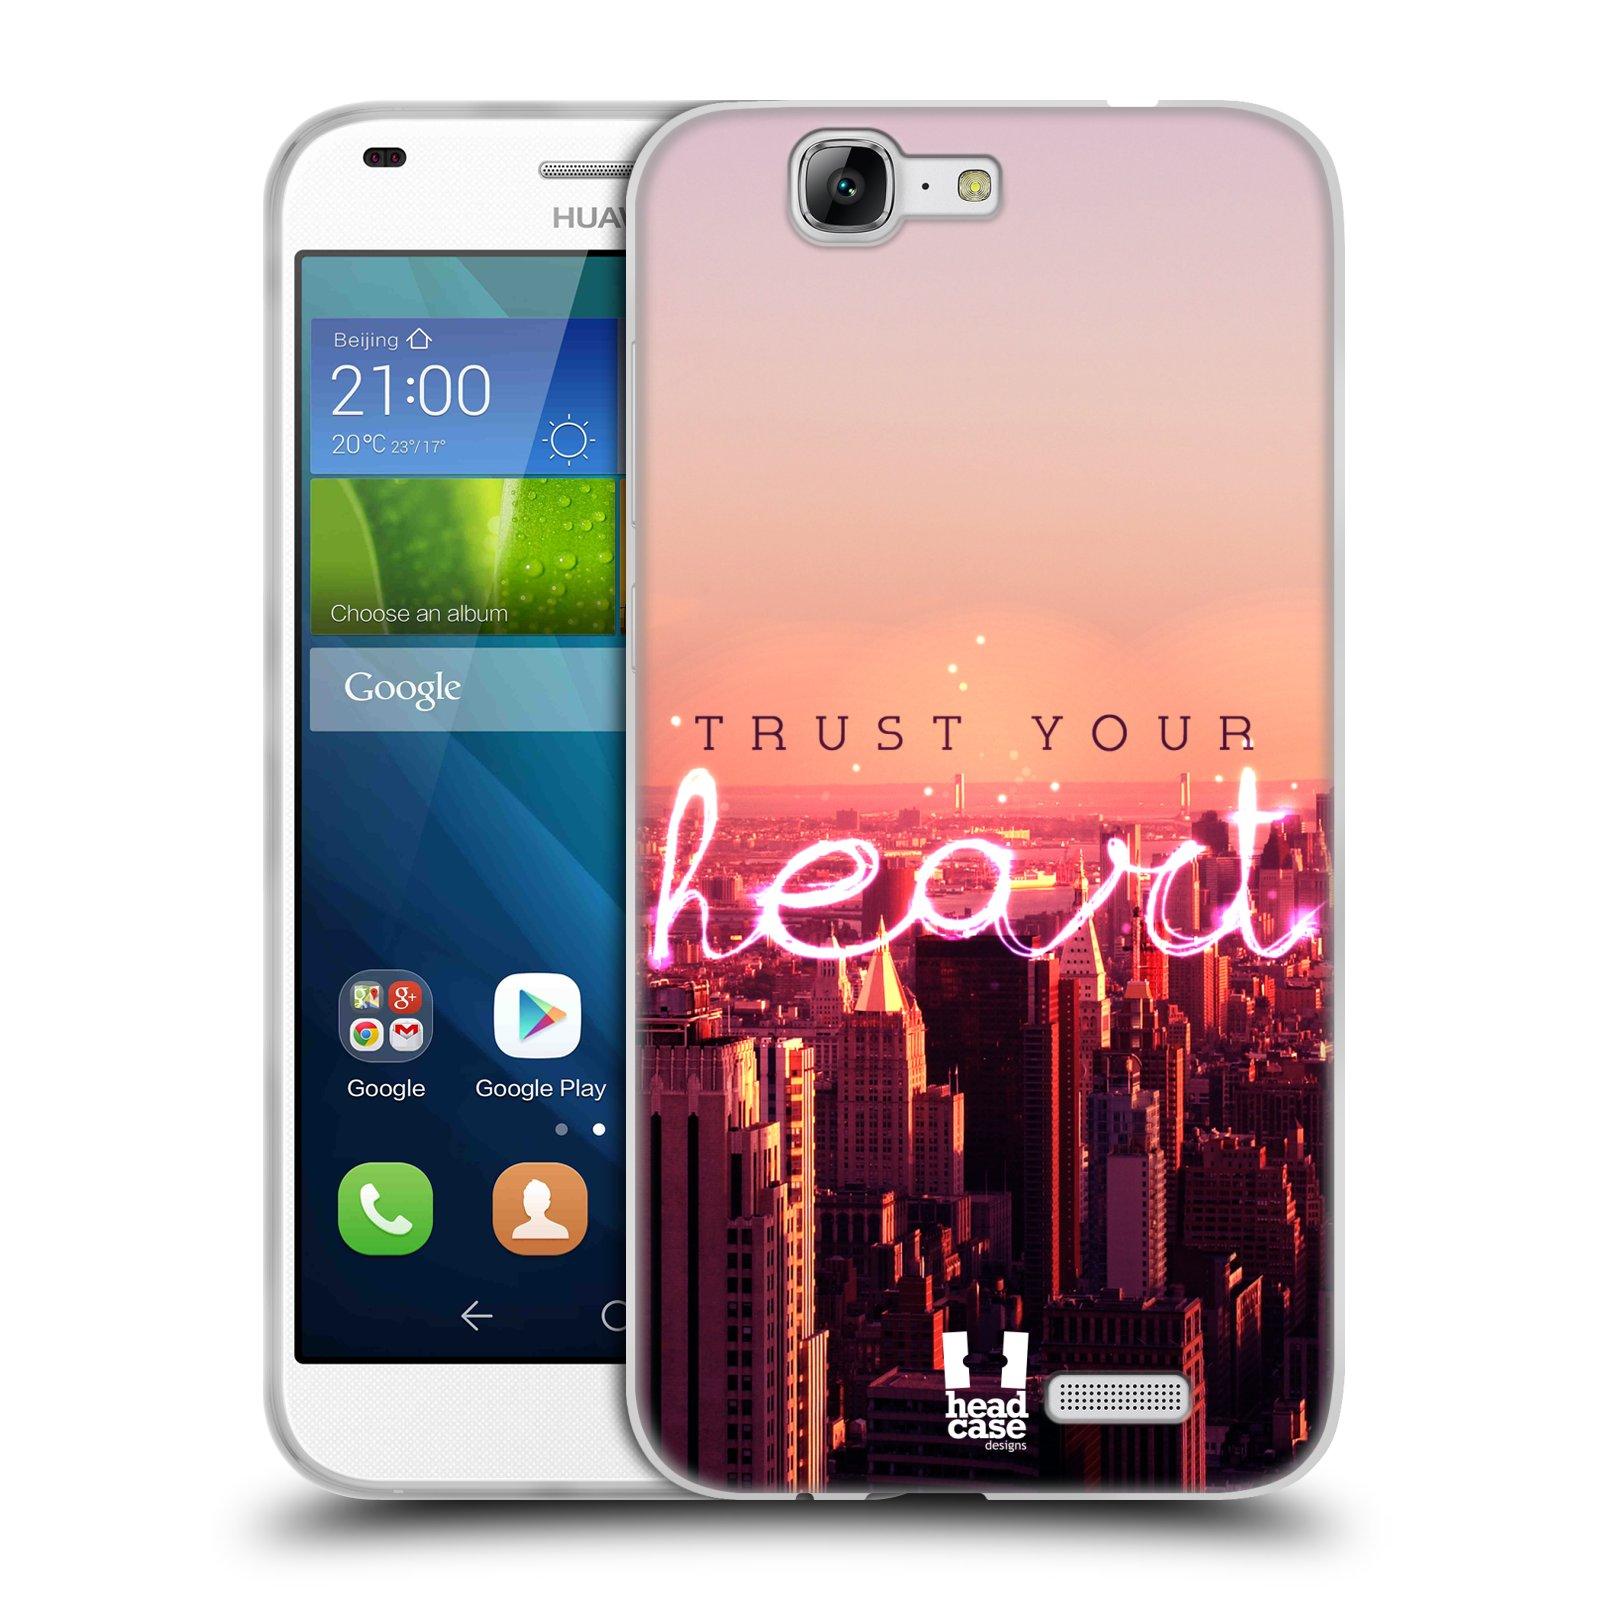 Silikonové pouzdro na mobil Huawei Ascend G7 HEAD CASE TRUST YOUR HEART (Silikonový kryt či obal na mobilní telefon Huawei Ascend G7)